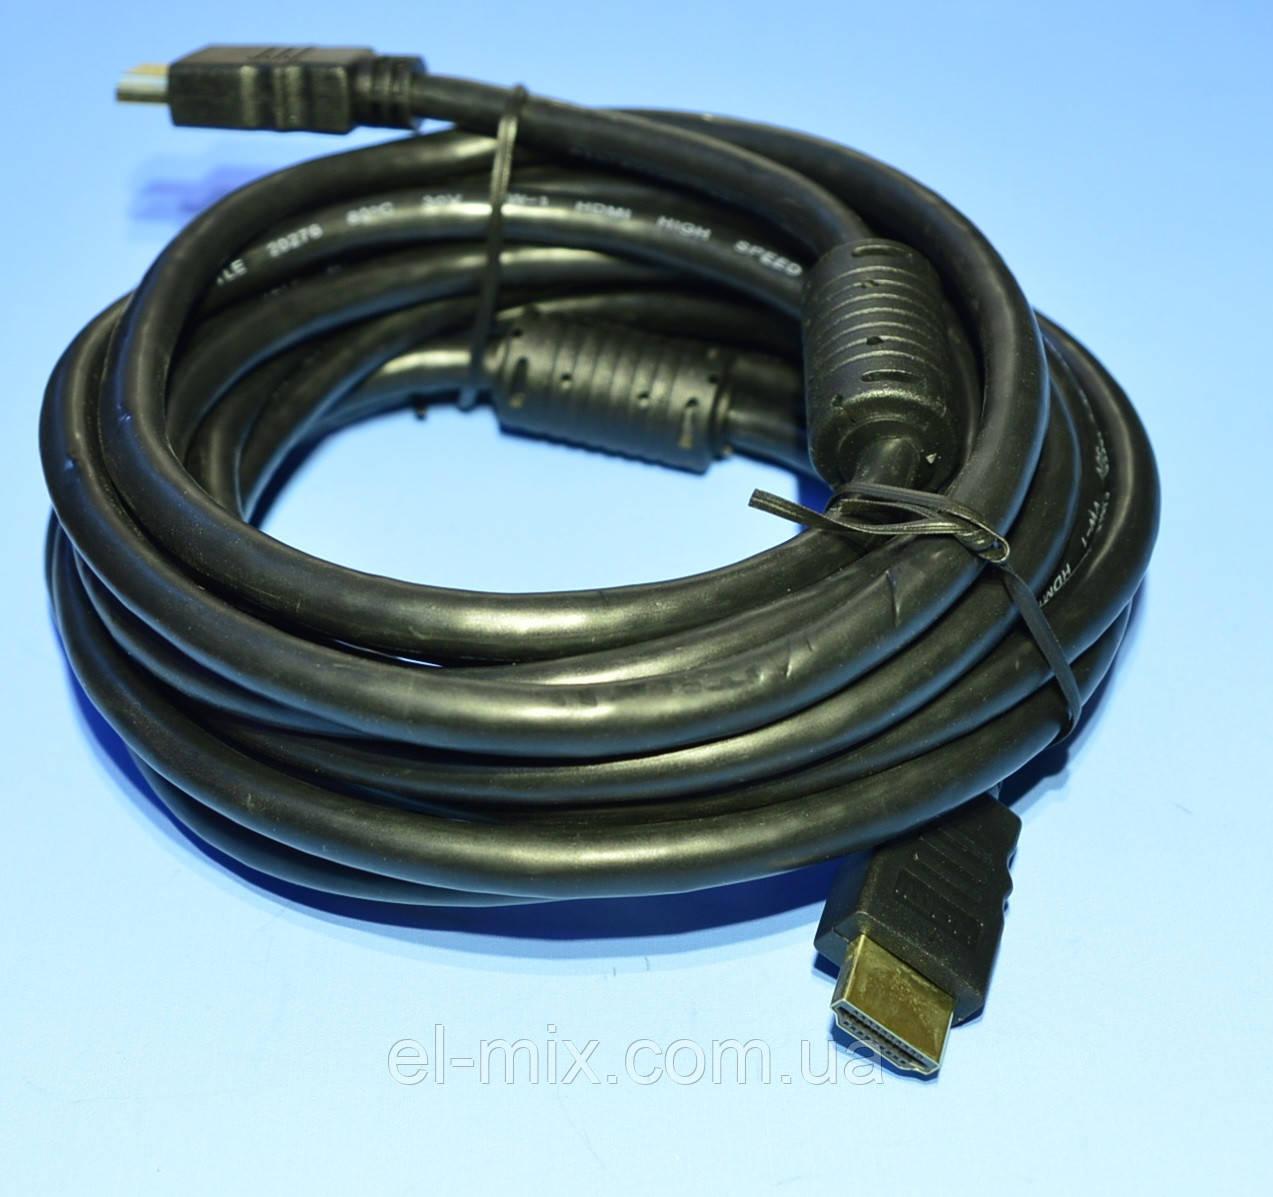 Шнур шт.HDMI - шт.HDMI  KPO3703-5.0 с фильтрами 5.0м